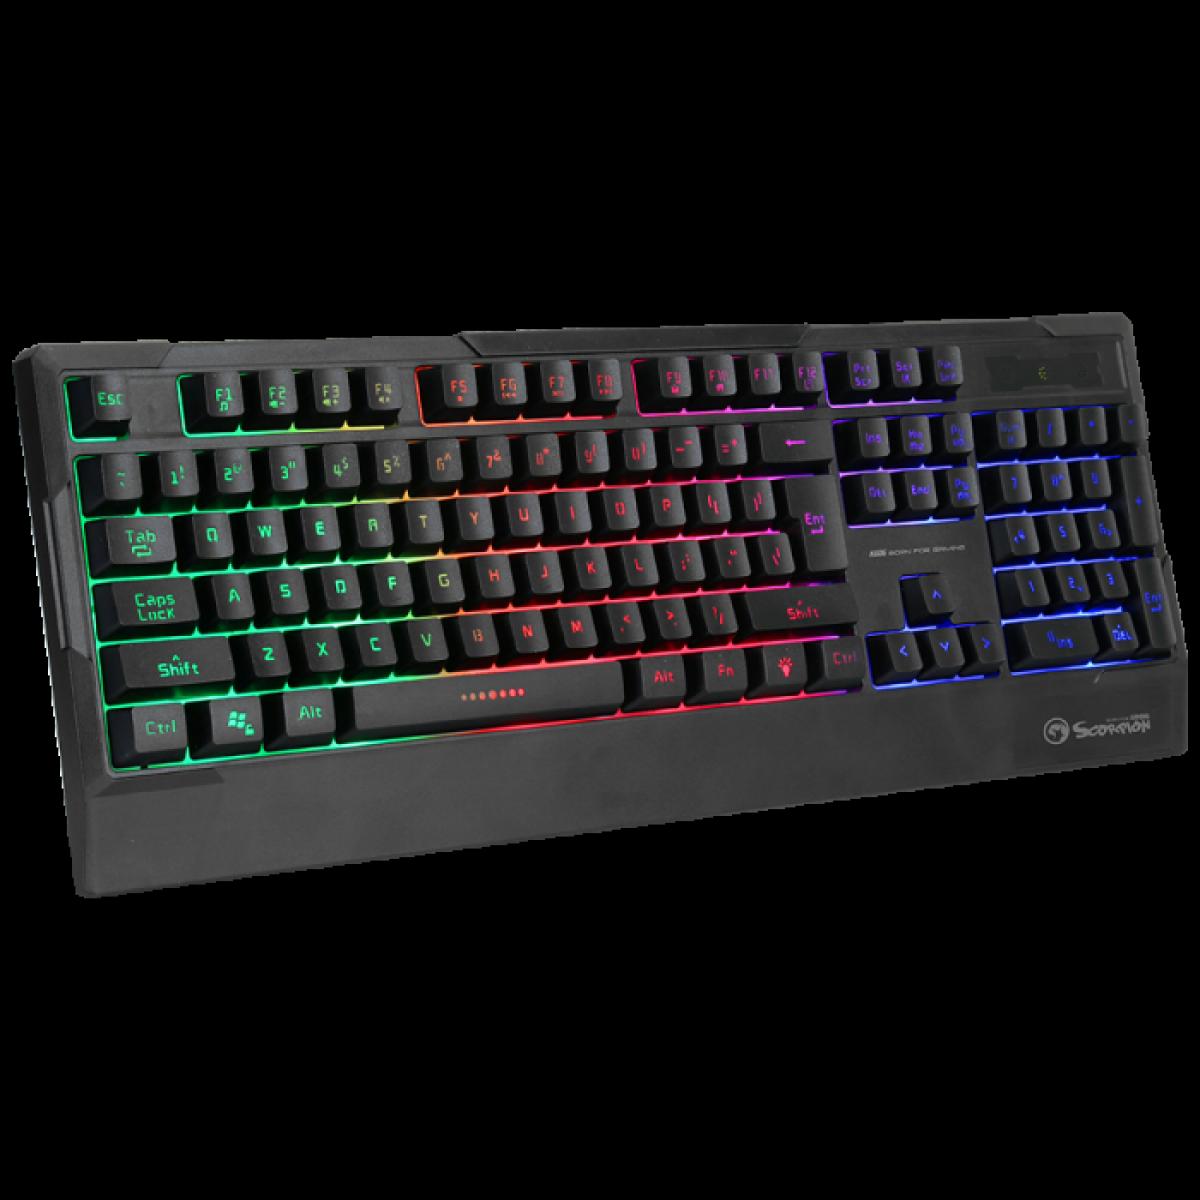 Teclado Gamer Marvo K606, Membrana, Rainbow